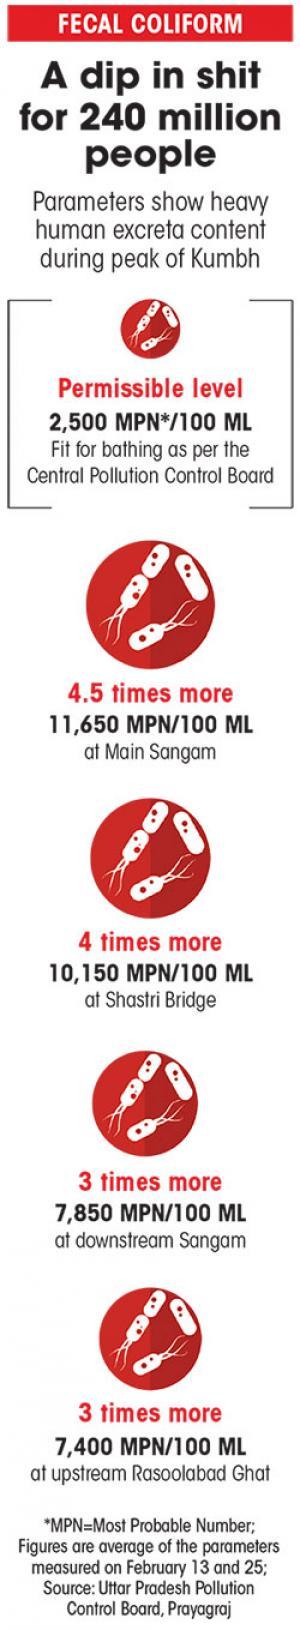 Source: Uttar Pradesh Pollution Control Board, Prayagraj